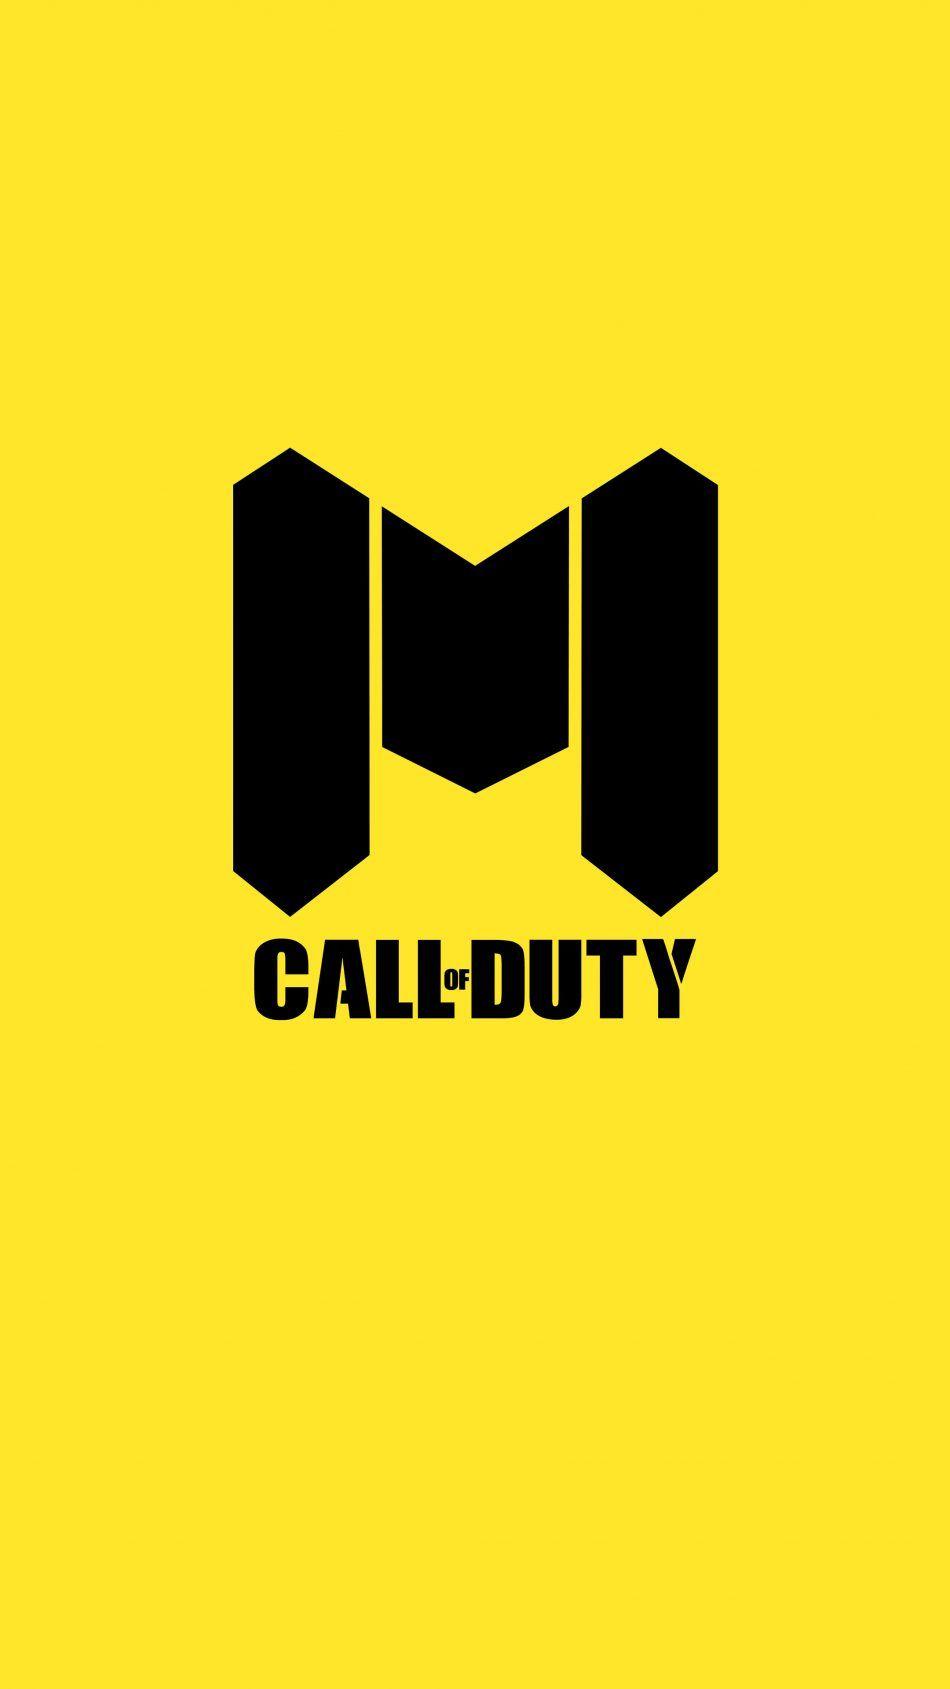 Call Of Duty Mobile Logo Yellow Background 4k Ultra Hd Mobile Wallpaper Call Of Duty Mobile Logo Logo Yellow